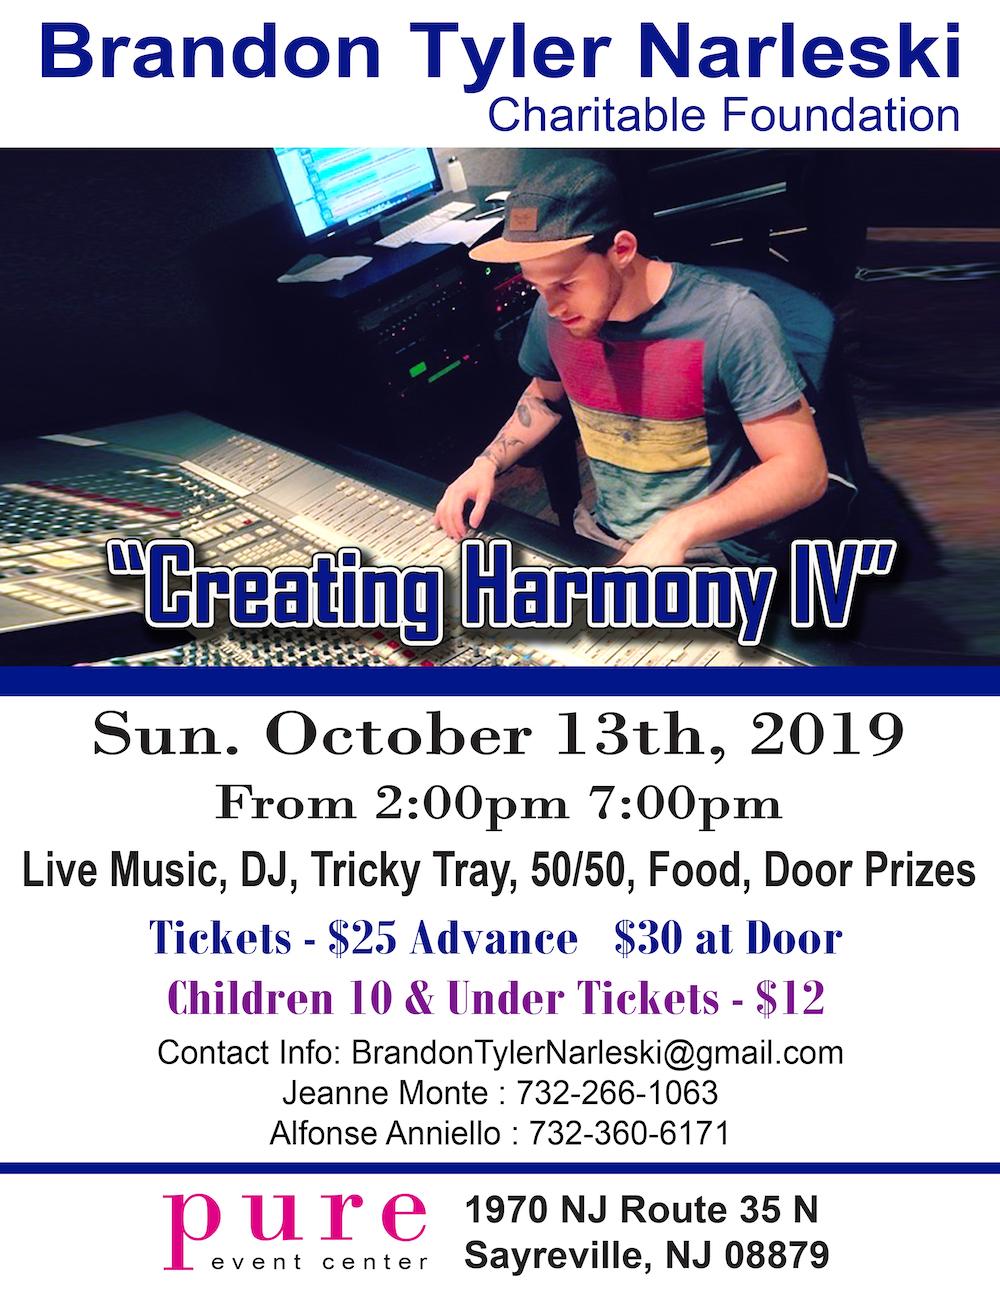 Creating Harmony , Fundraiser , nonprofit , 501c3, The Brandon Tyler Narleski Charitable Foundation